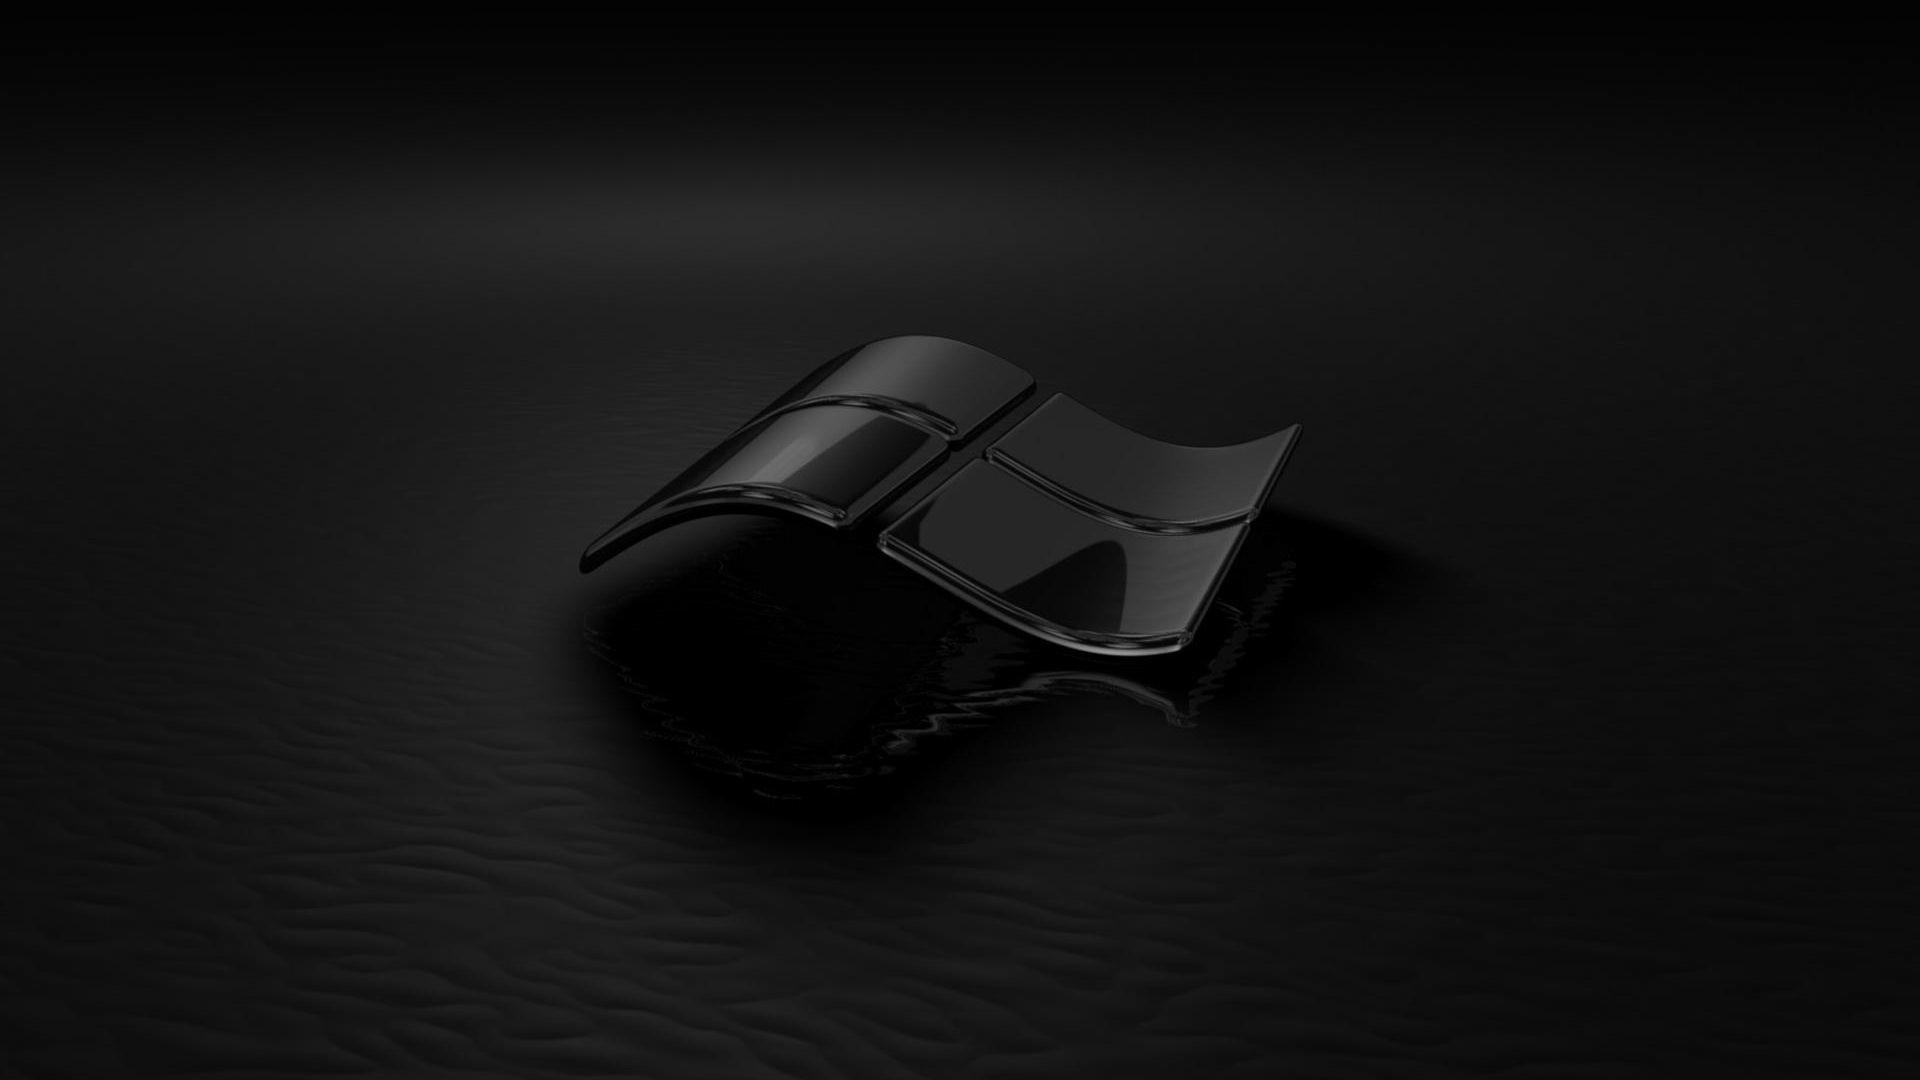 1080p Black Wallpaper 70 Images